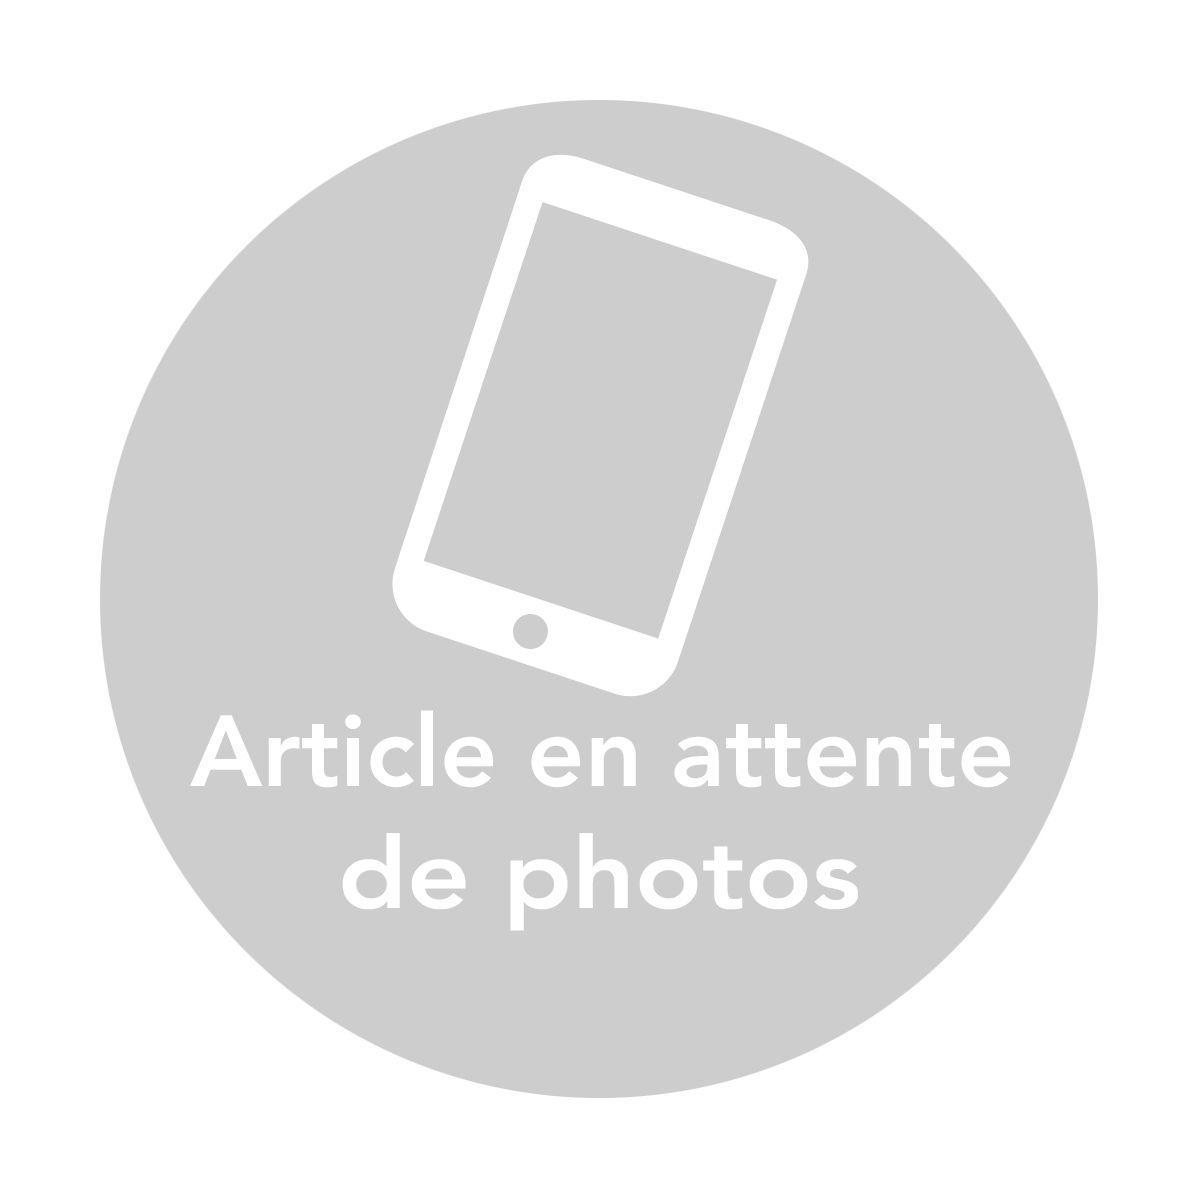 Support joby griptight one micro stand blanc/chrome - 7% de remise imm�diate avec le code : deal7 (photo)